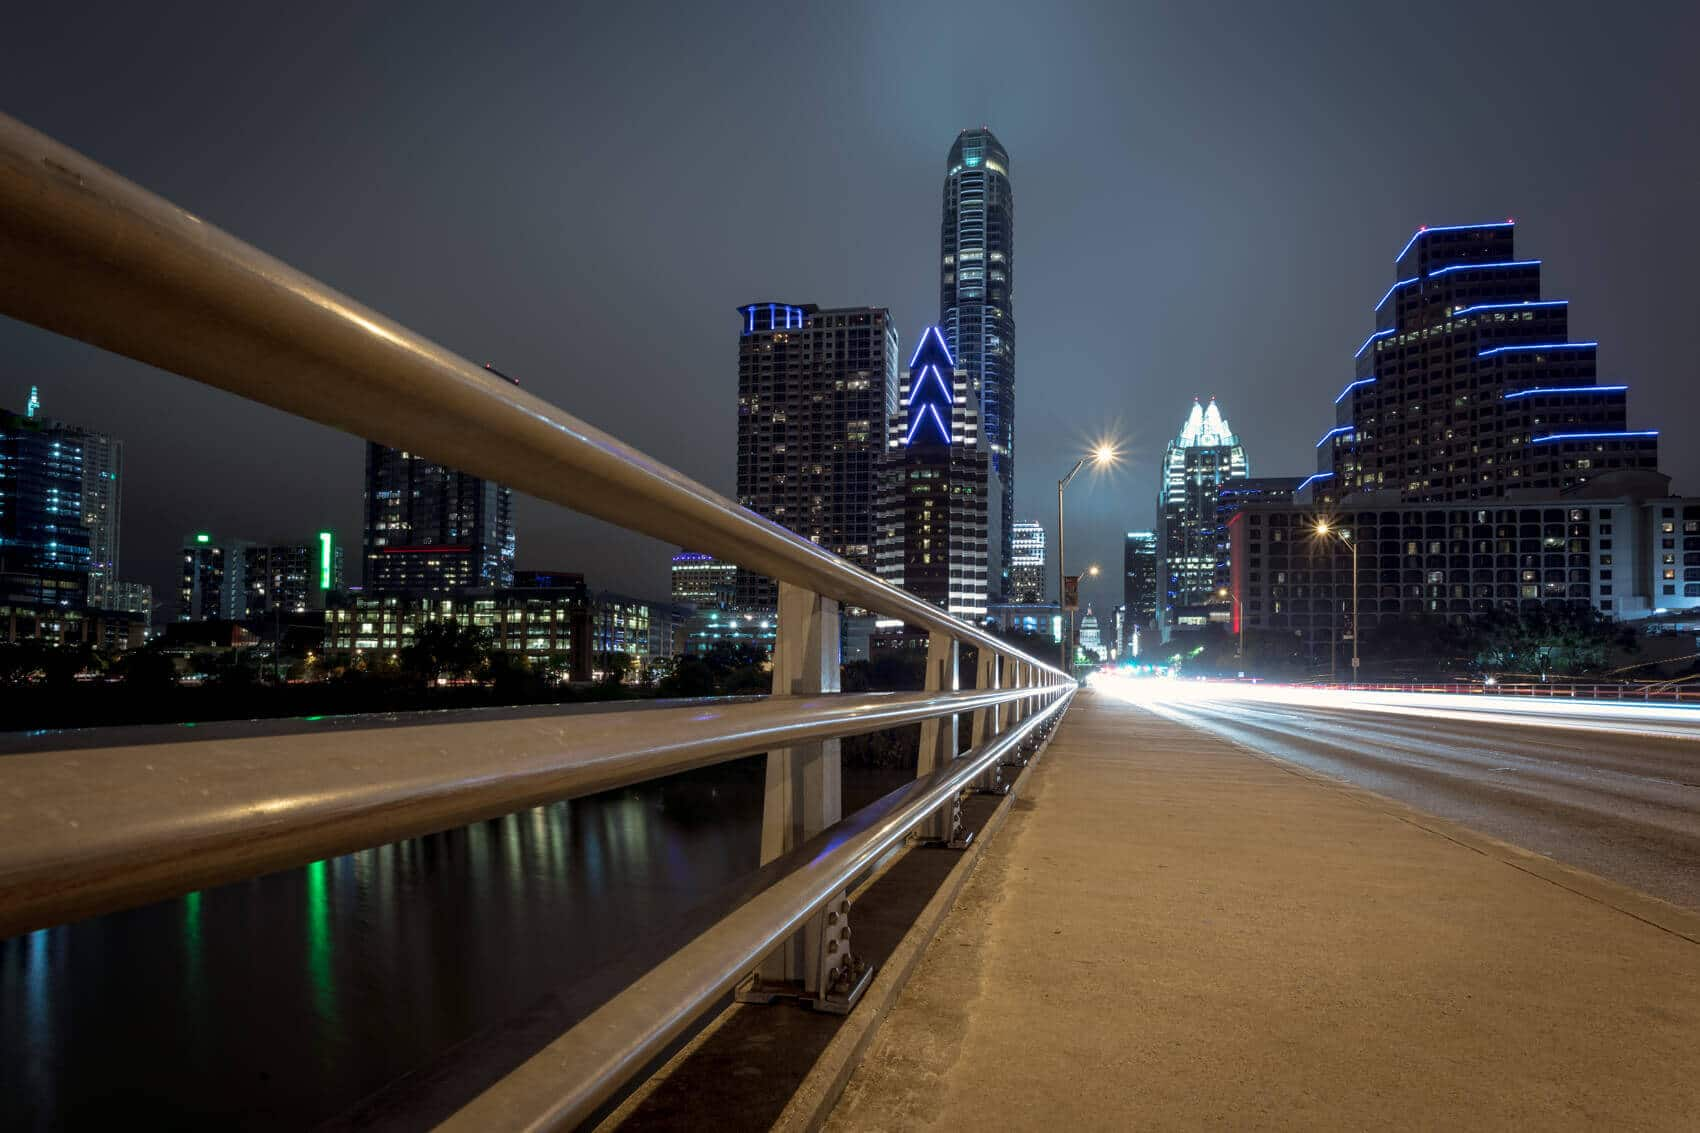 Downtown Austin from a pedestrian bridge at night.